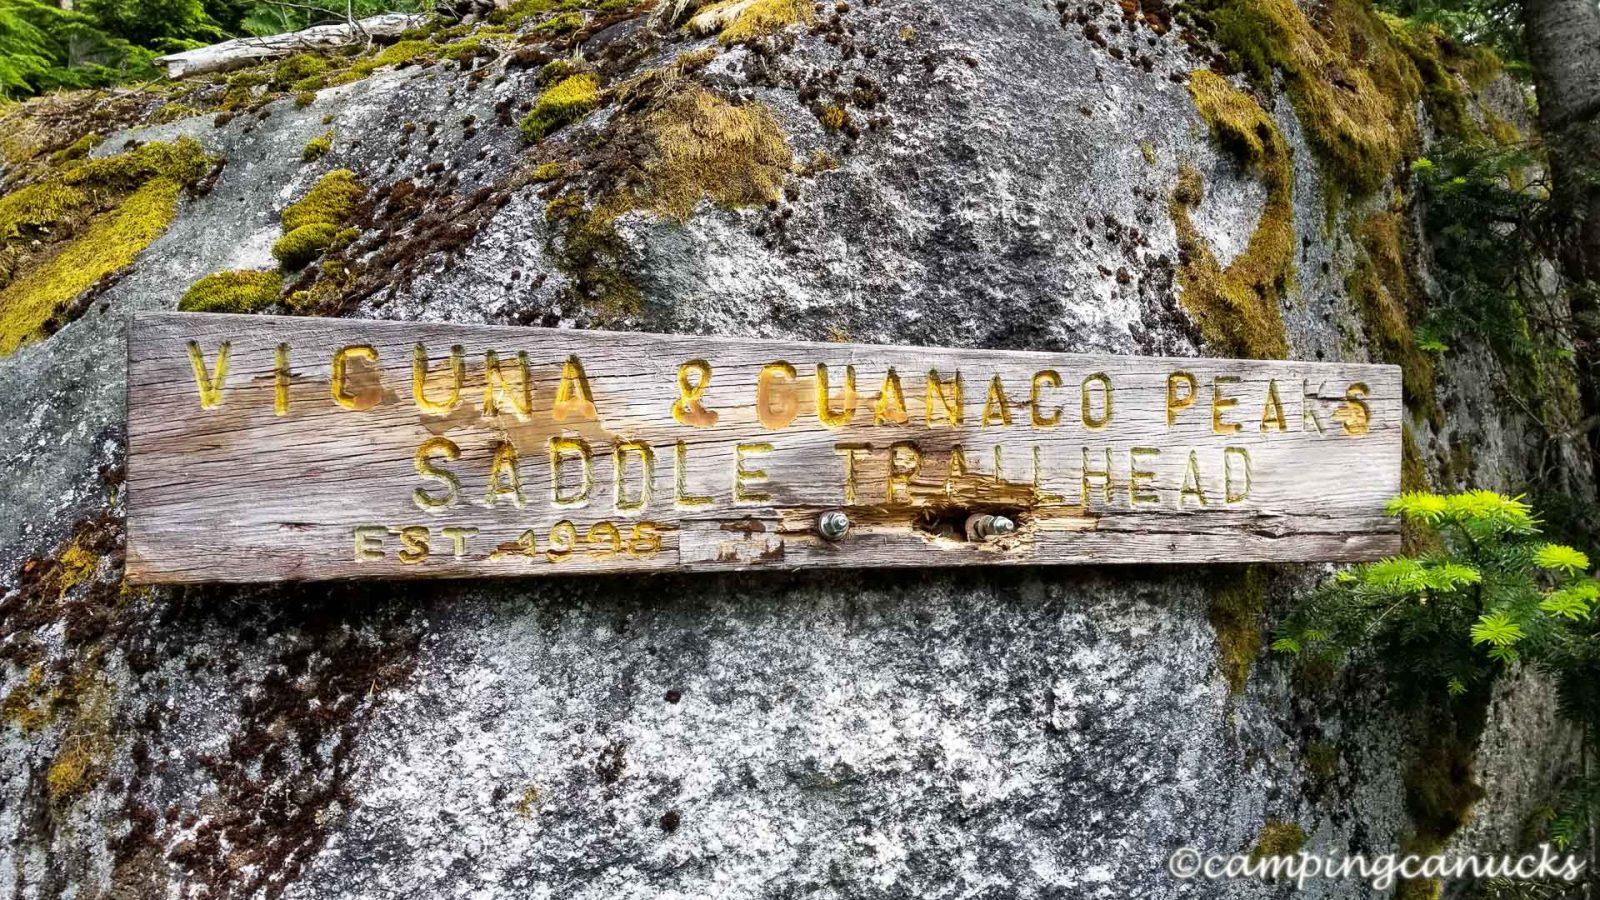 Trailhead sign